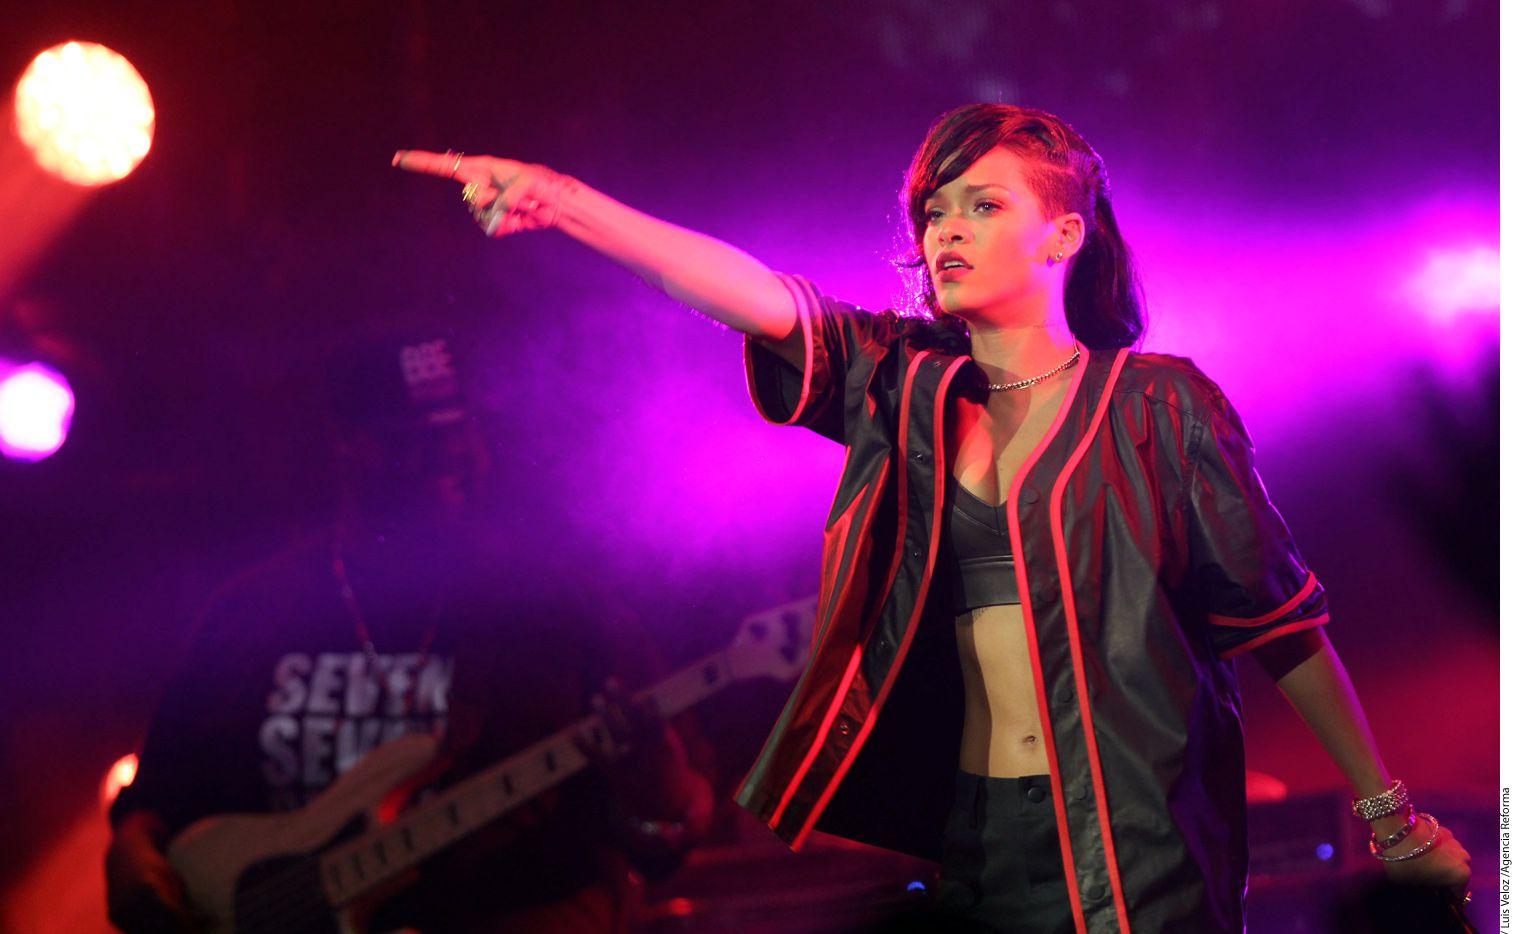 Rihanna emprenderá el próximo 26 de febrero su gira The Anti World Tour al lado de su novio Travis Scott./ AGENCIA REFORMA